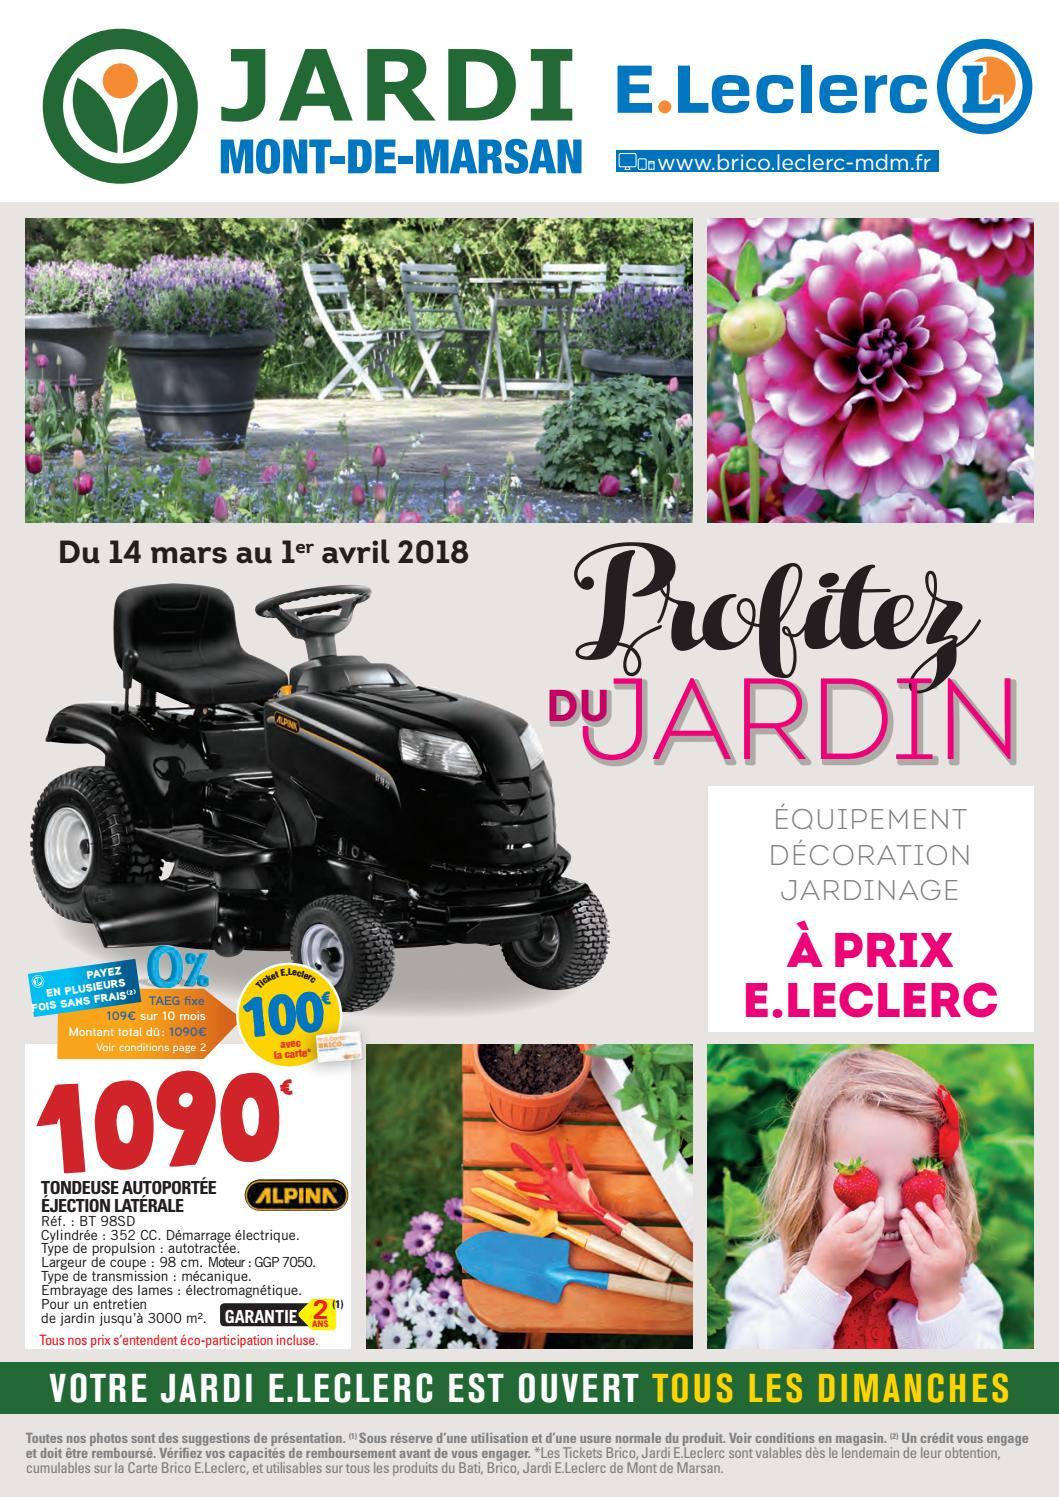 Catalogue Jardin - Jardi E.leclerc By Chou Magazine - Issuu dedans Salon De Jardin Pas Cher Leclerc